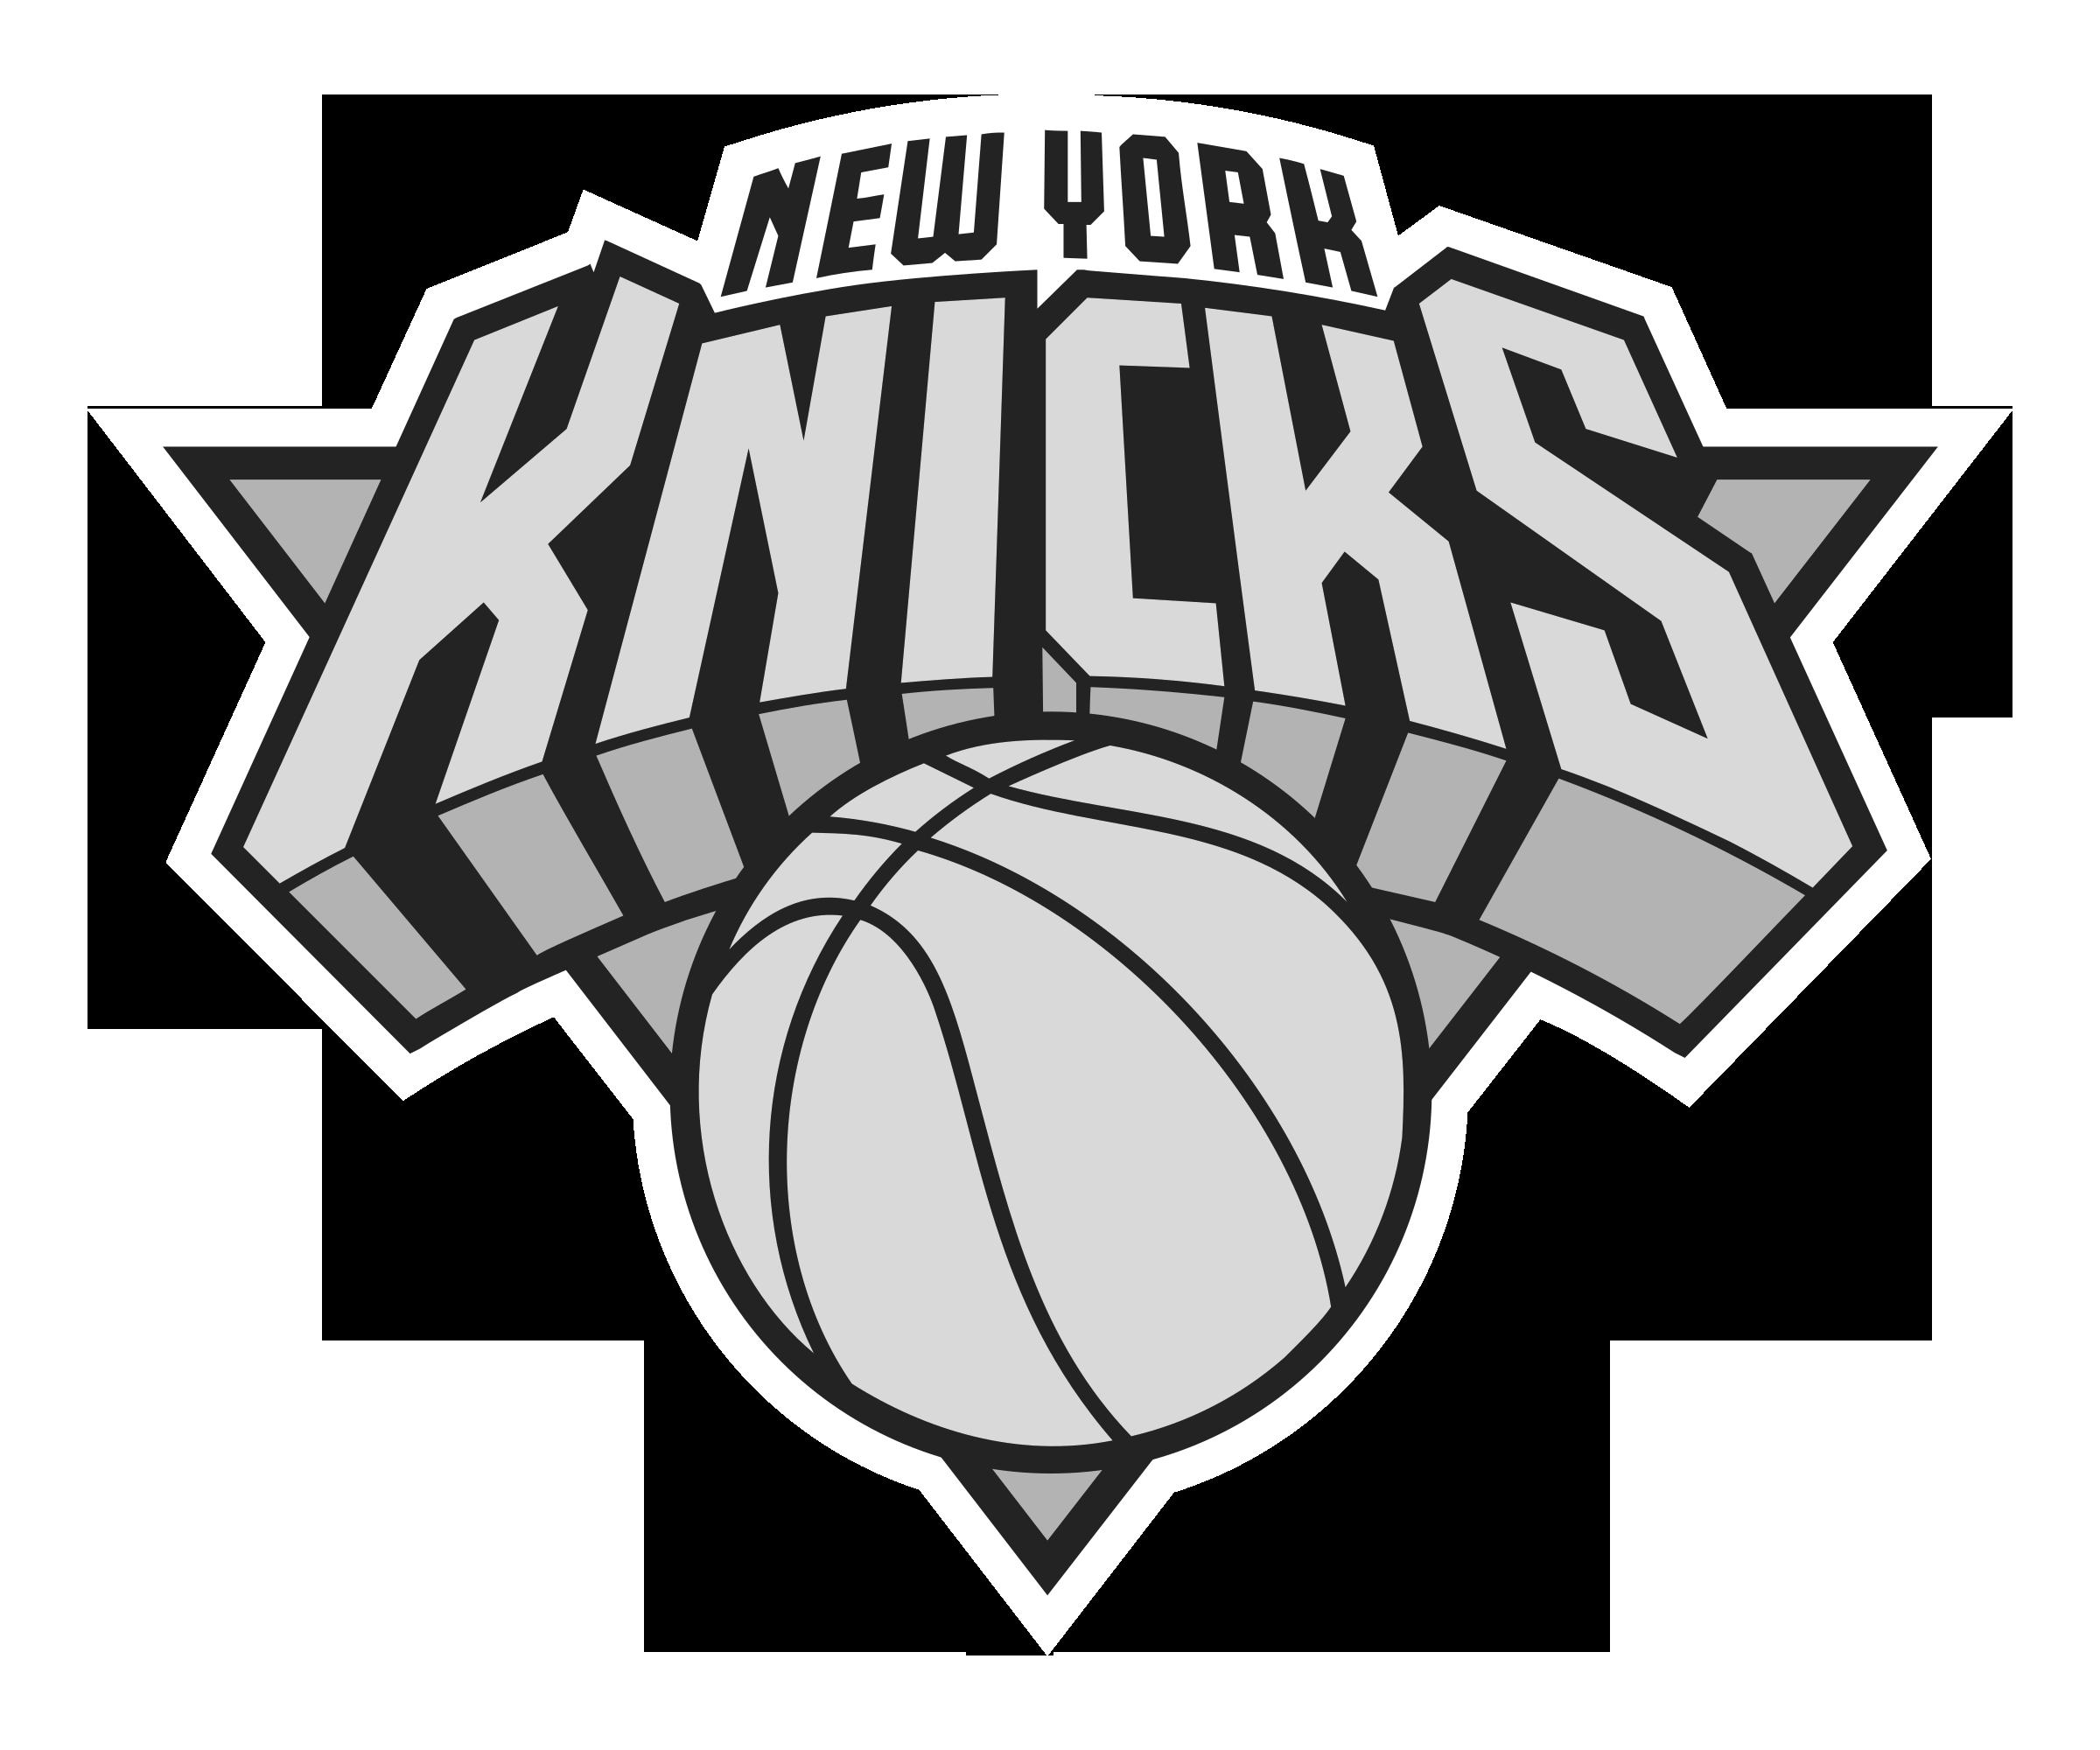 New York Knicks Logo PNG Transparent & SVG Vector.